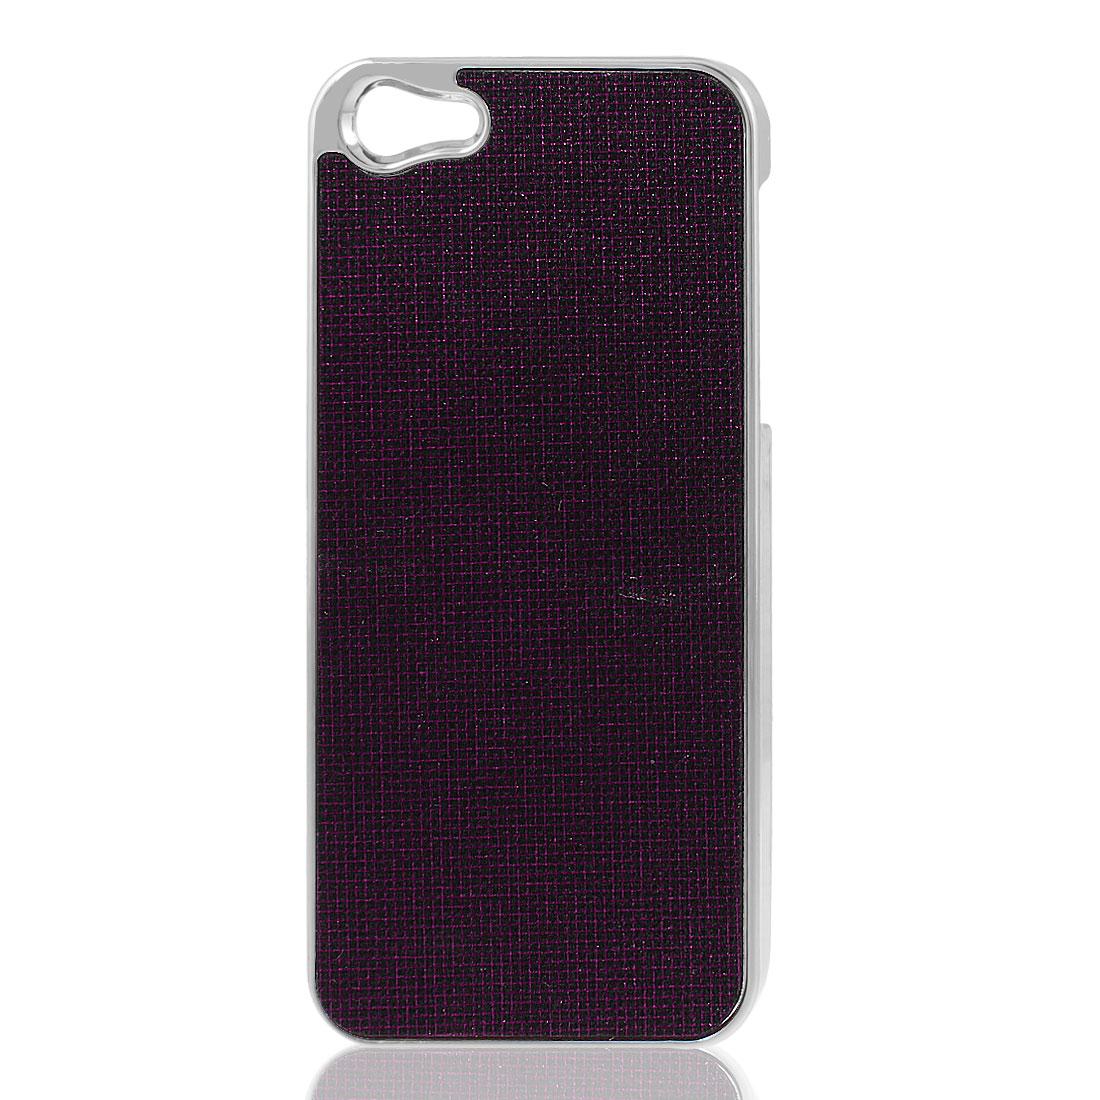 Dark Purple Bling Glittery Hard Back Case Cover Shell for iPhone 5 5G